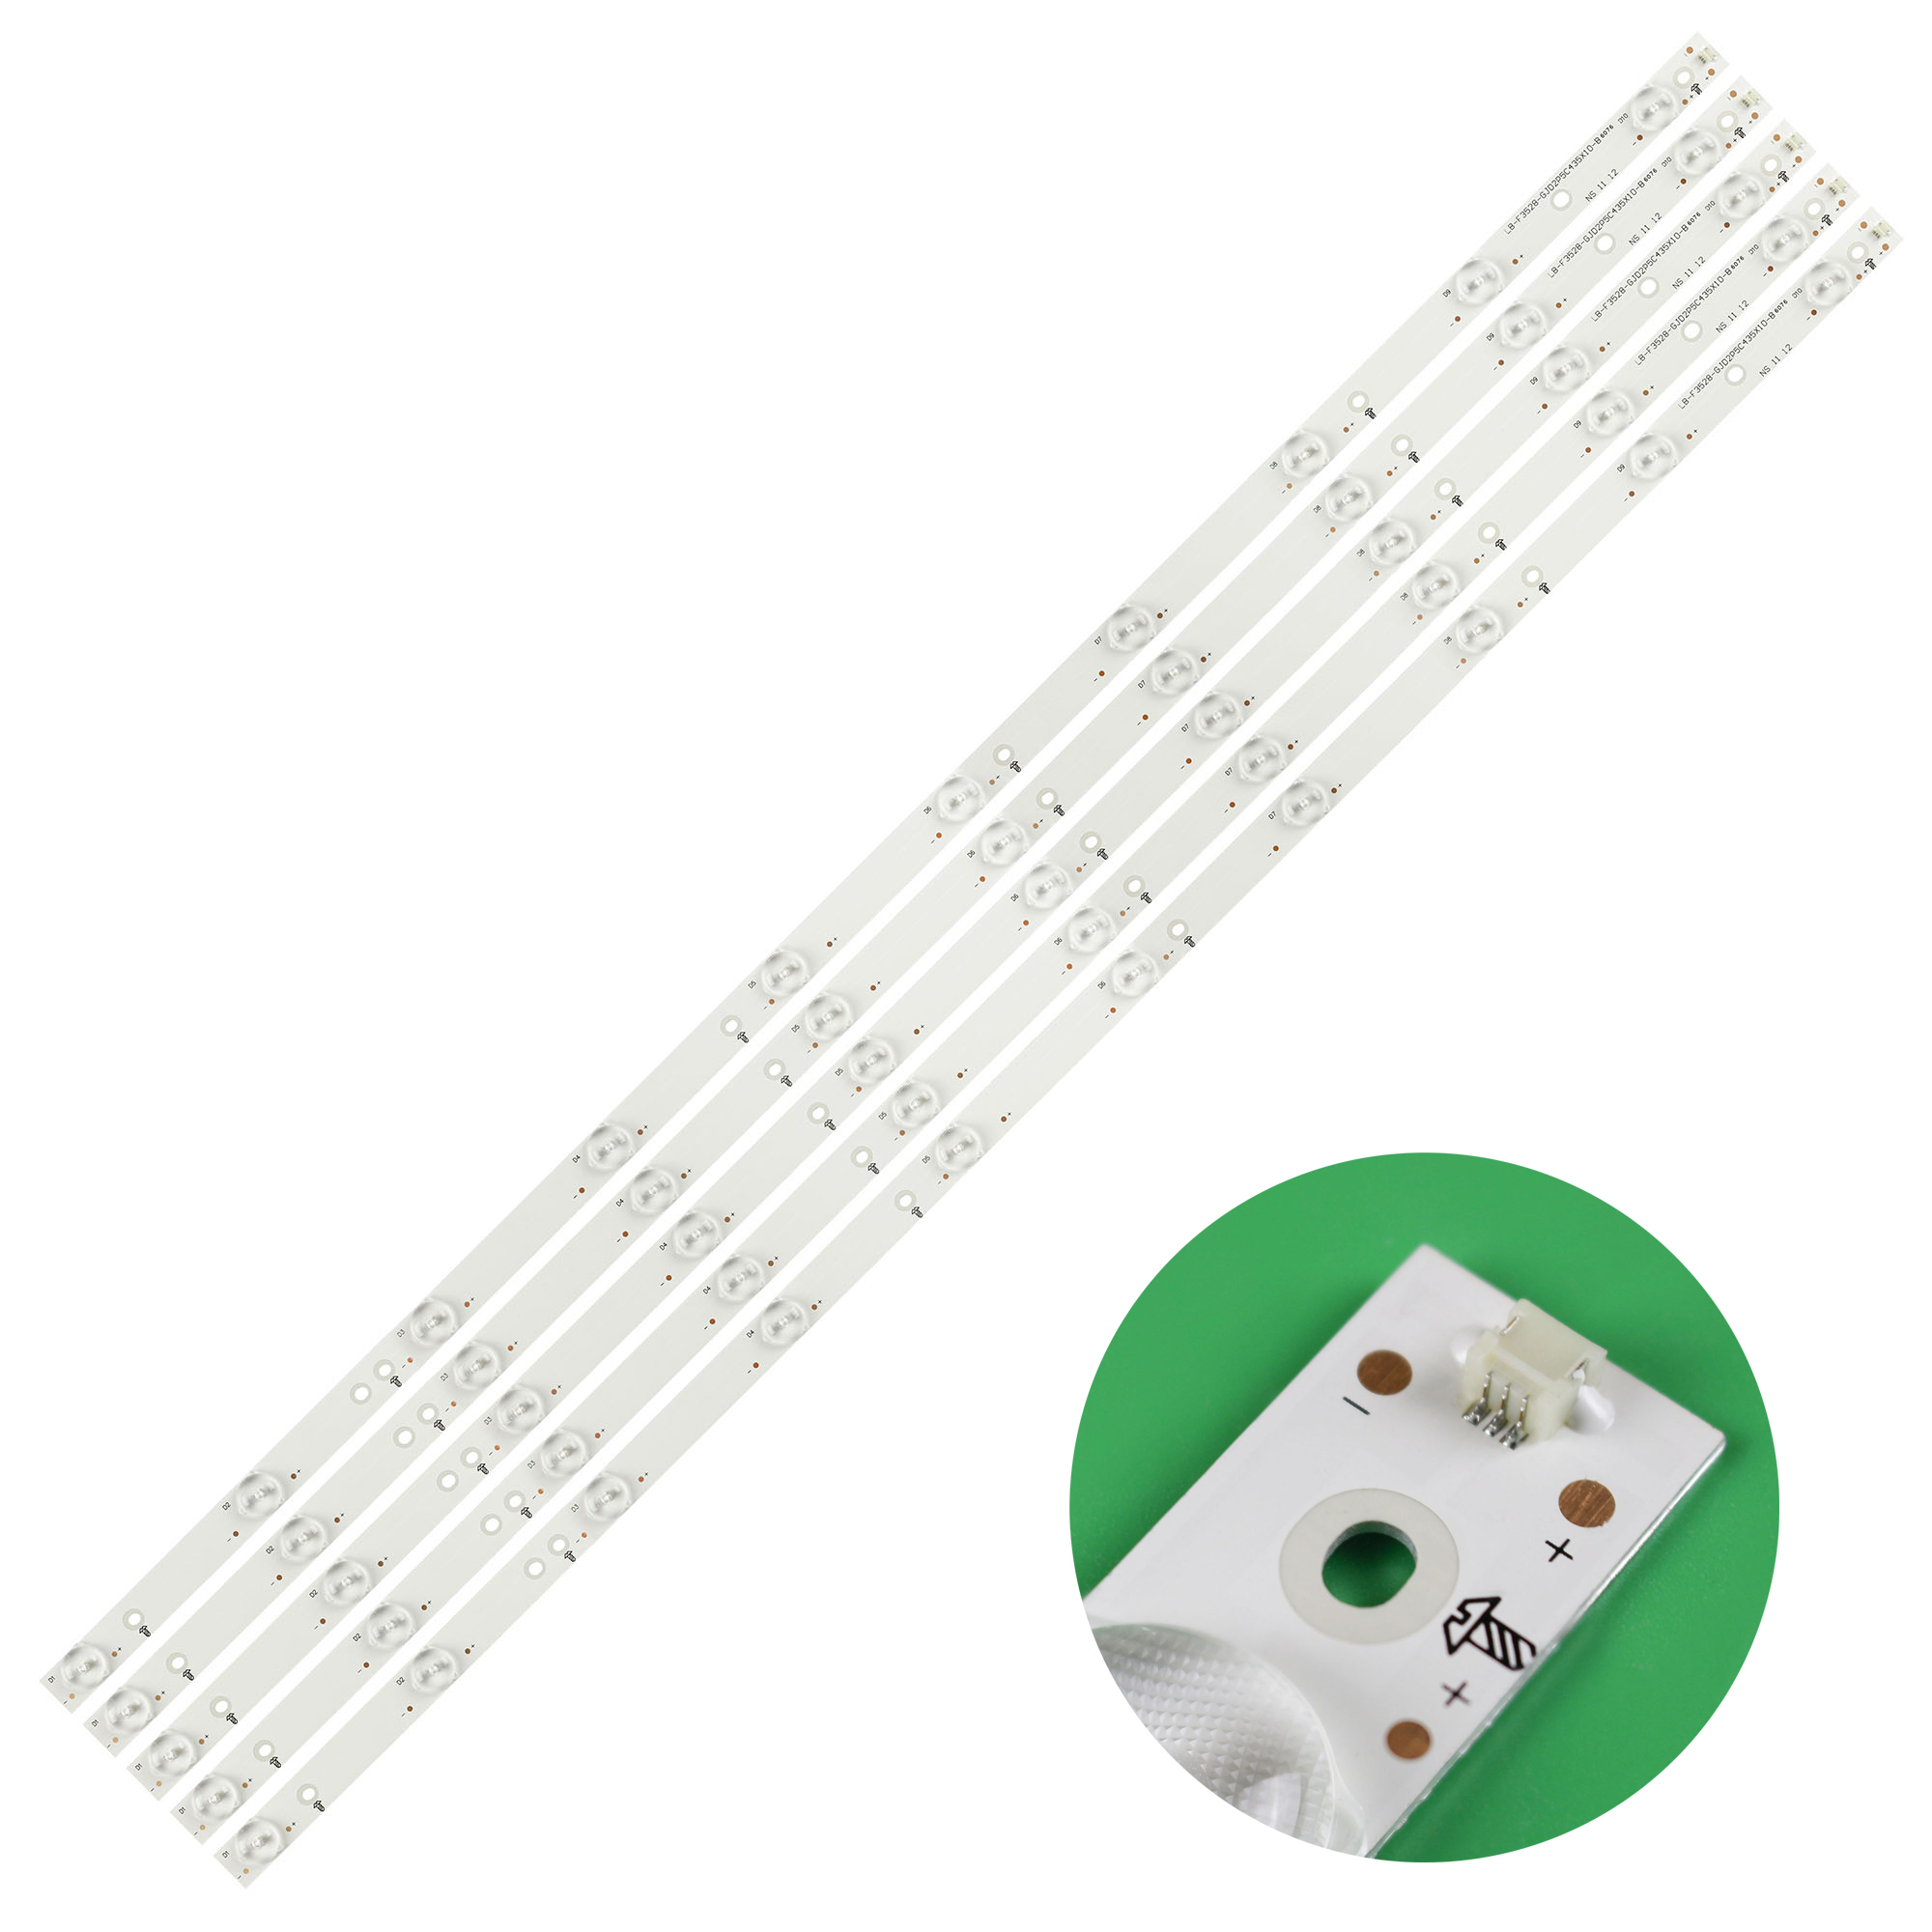 3V GJ-2K15-430-D510 Led-Backlight-Strip New for 43PFT4131 01Q58-A 10LED 5pcs/Set